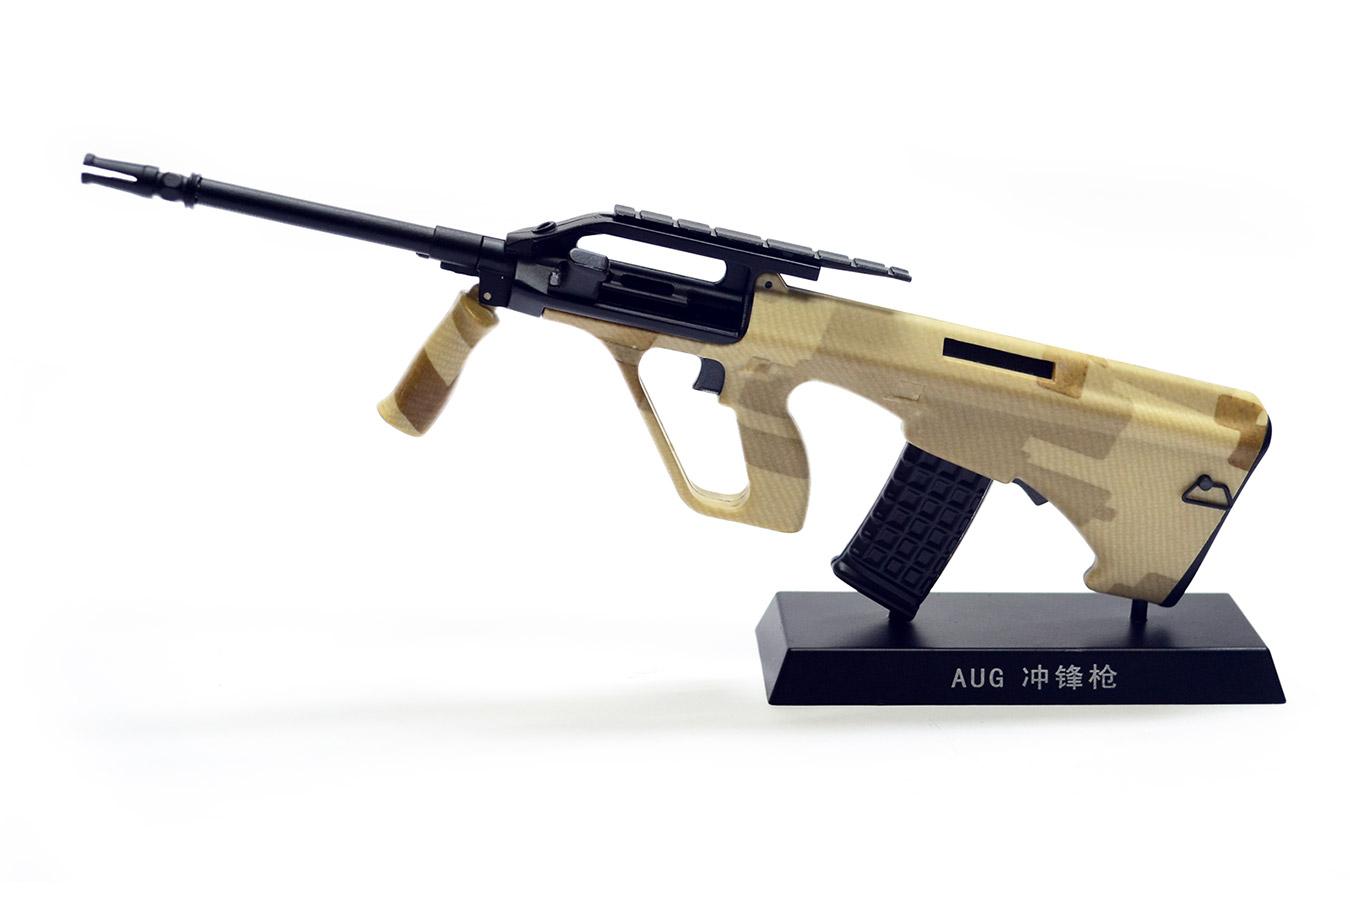 Макет армейской винтовки Steyr AUG в масштабе 1:4 хаки